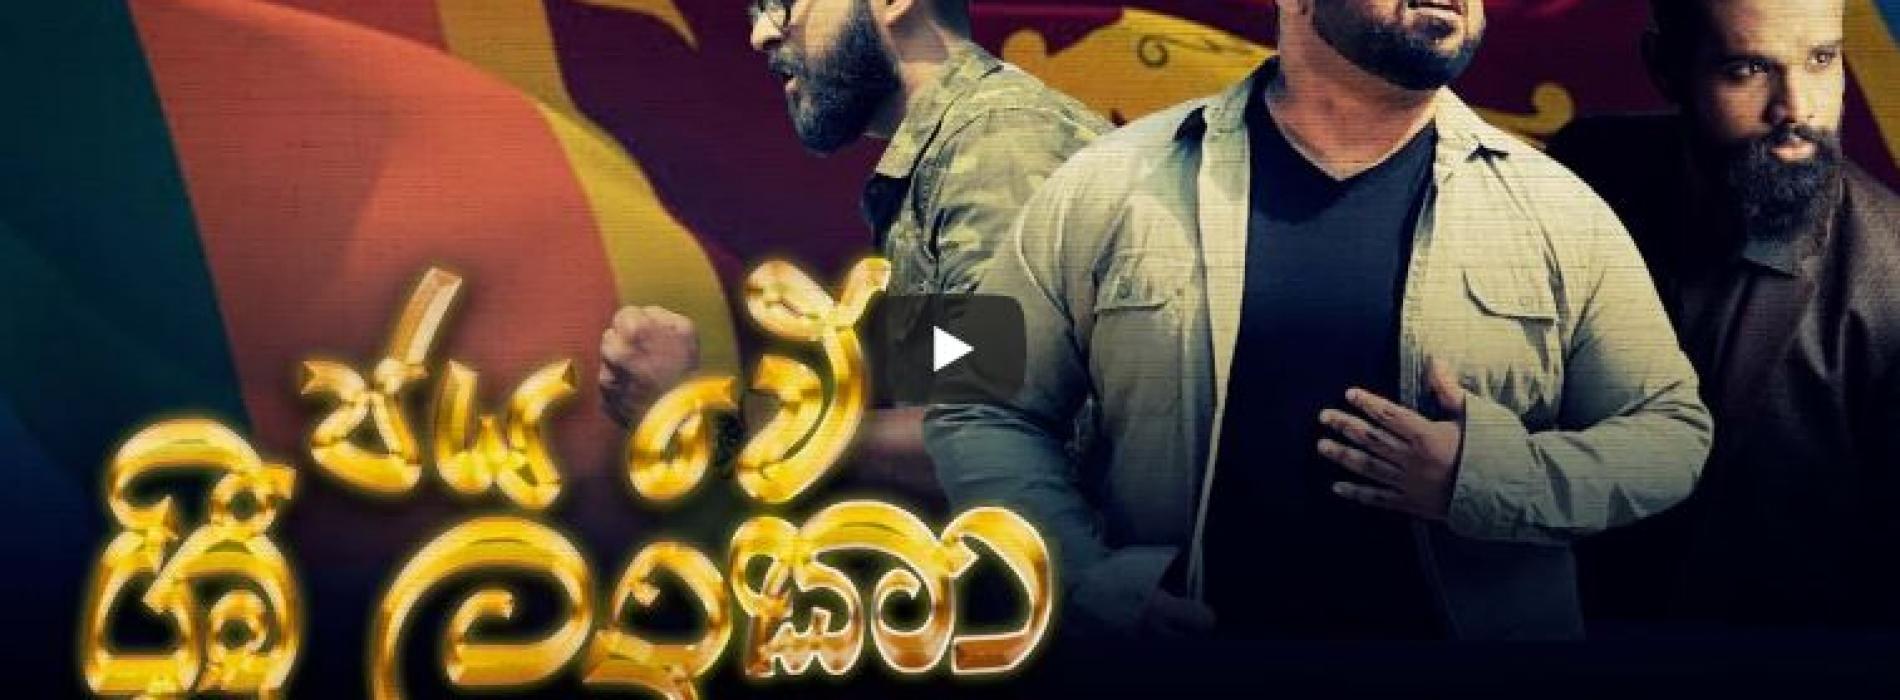 Jaya We Sri Lanka | Keshan Perera Feat Mihindu Ariyaratne And Dumal Warnakulasuriya